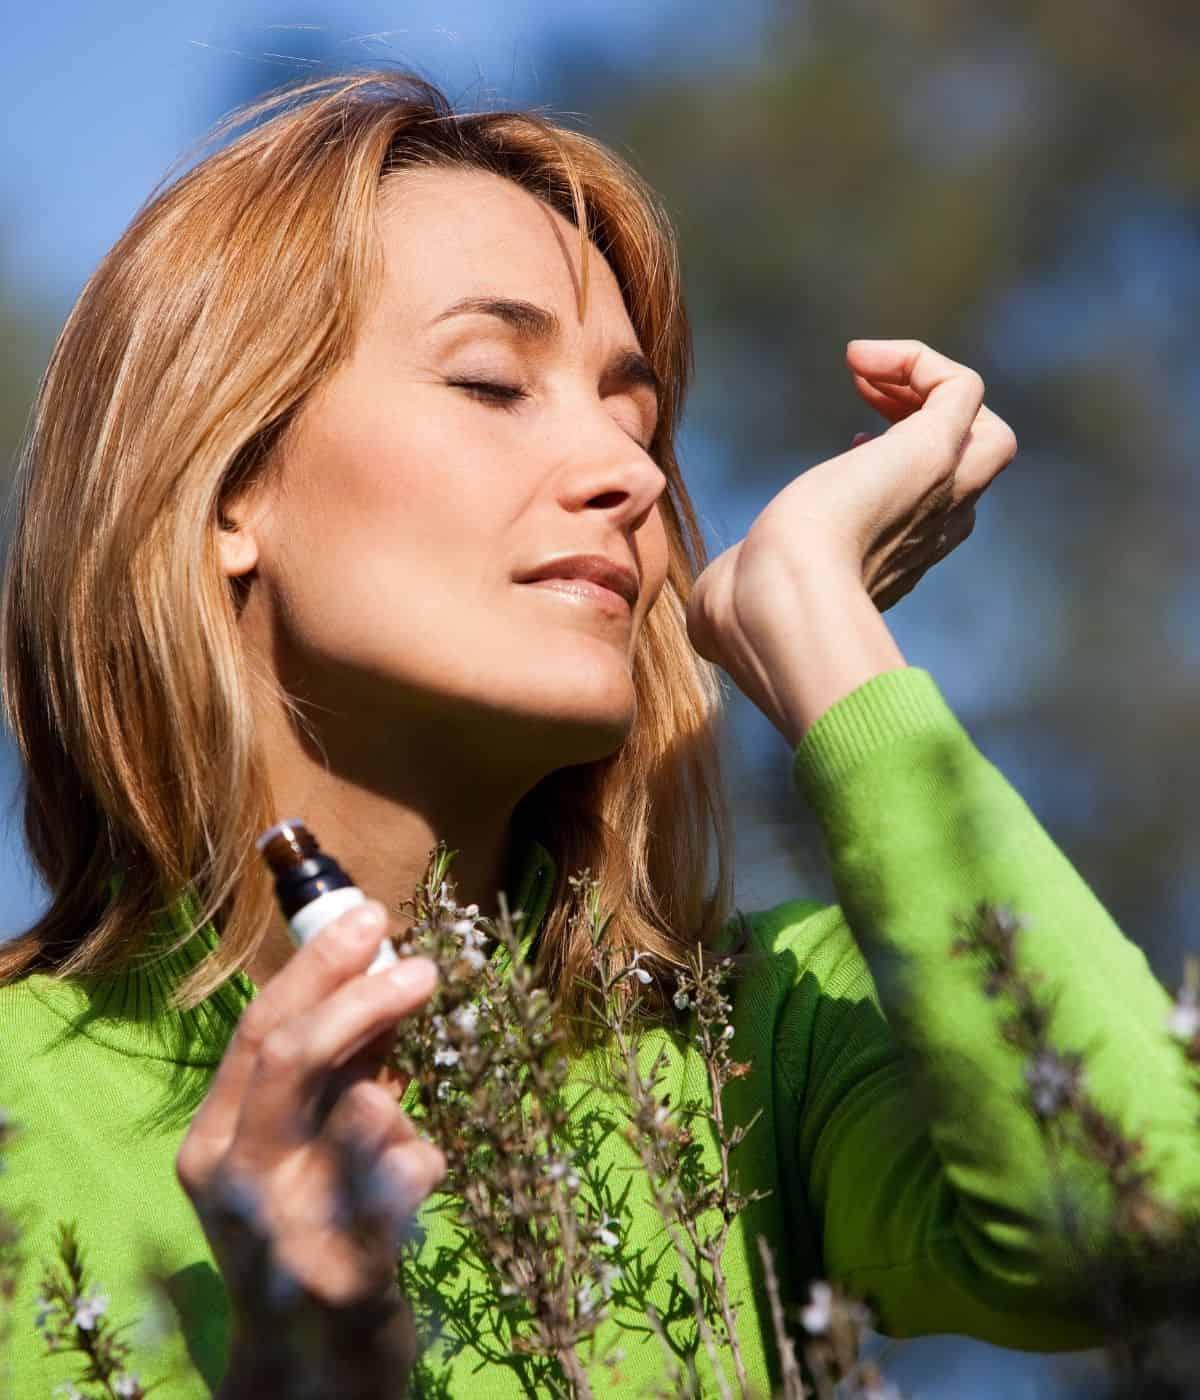 Woman inhaling essential oils on her wrist.